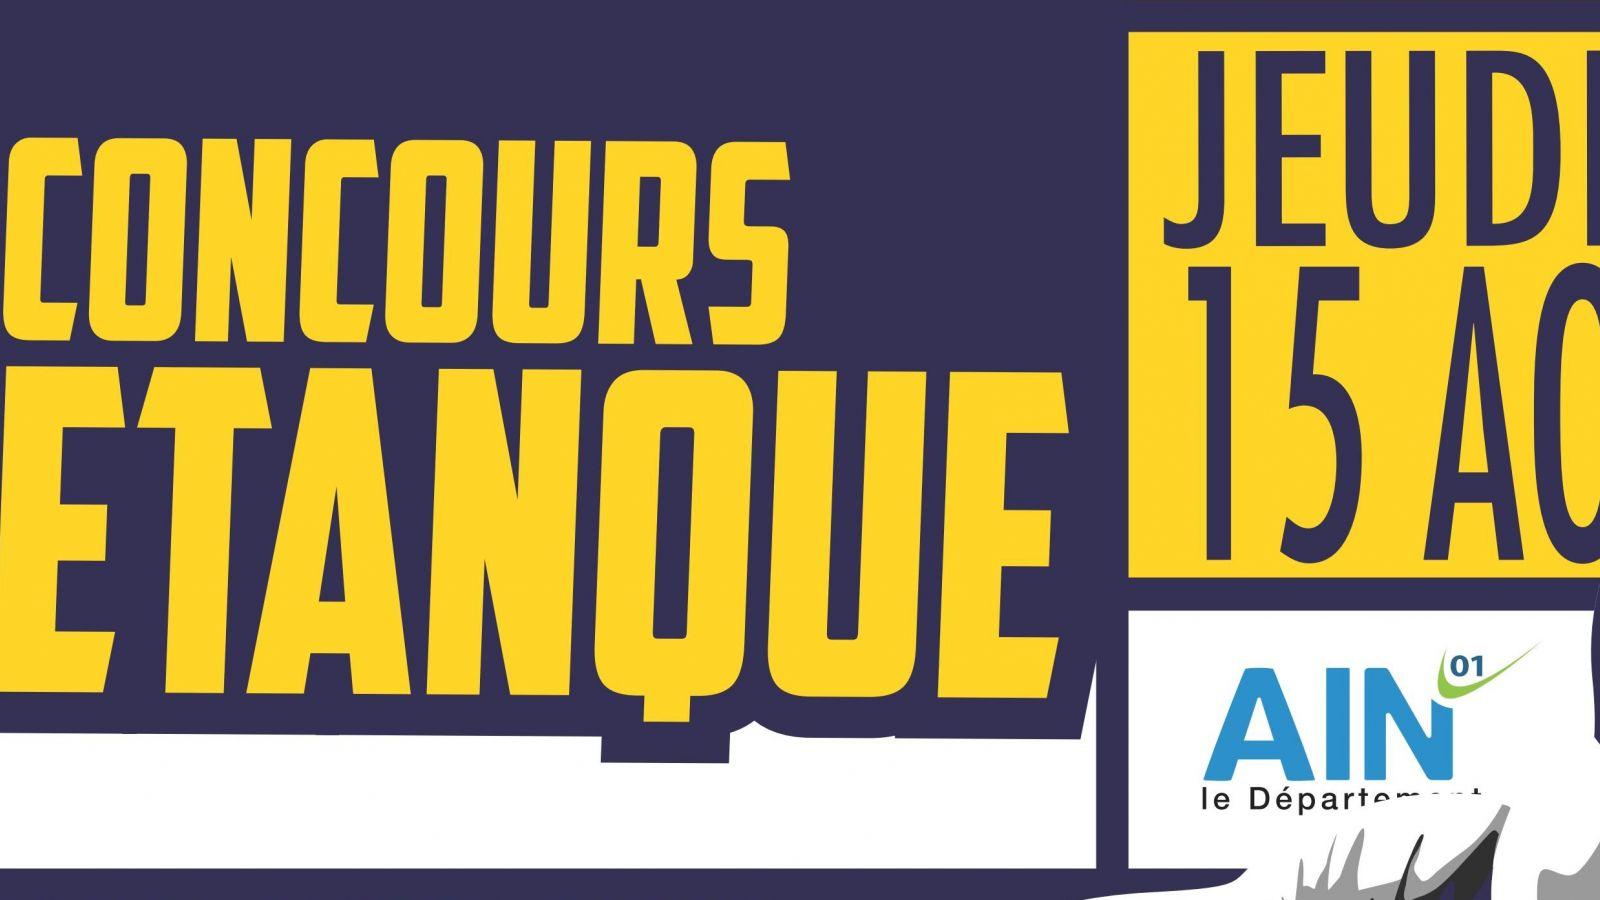 Concours de pétanque, jeudi 15 août 2019